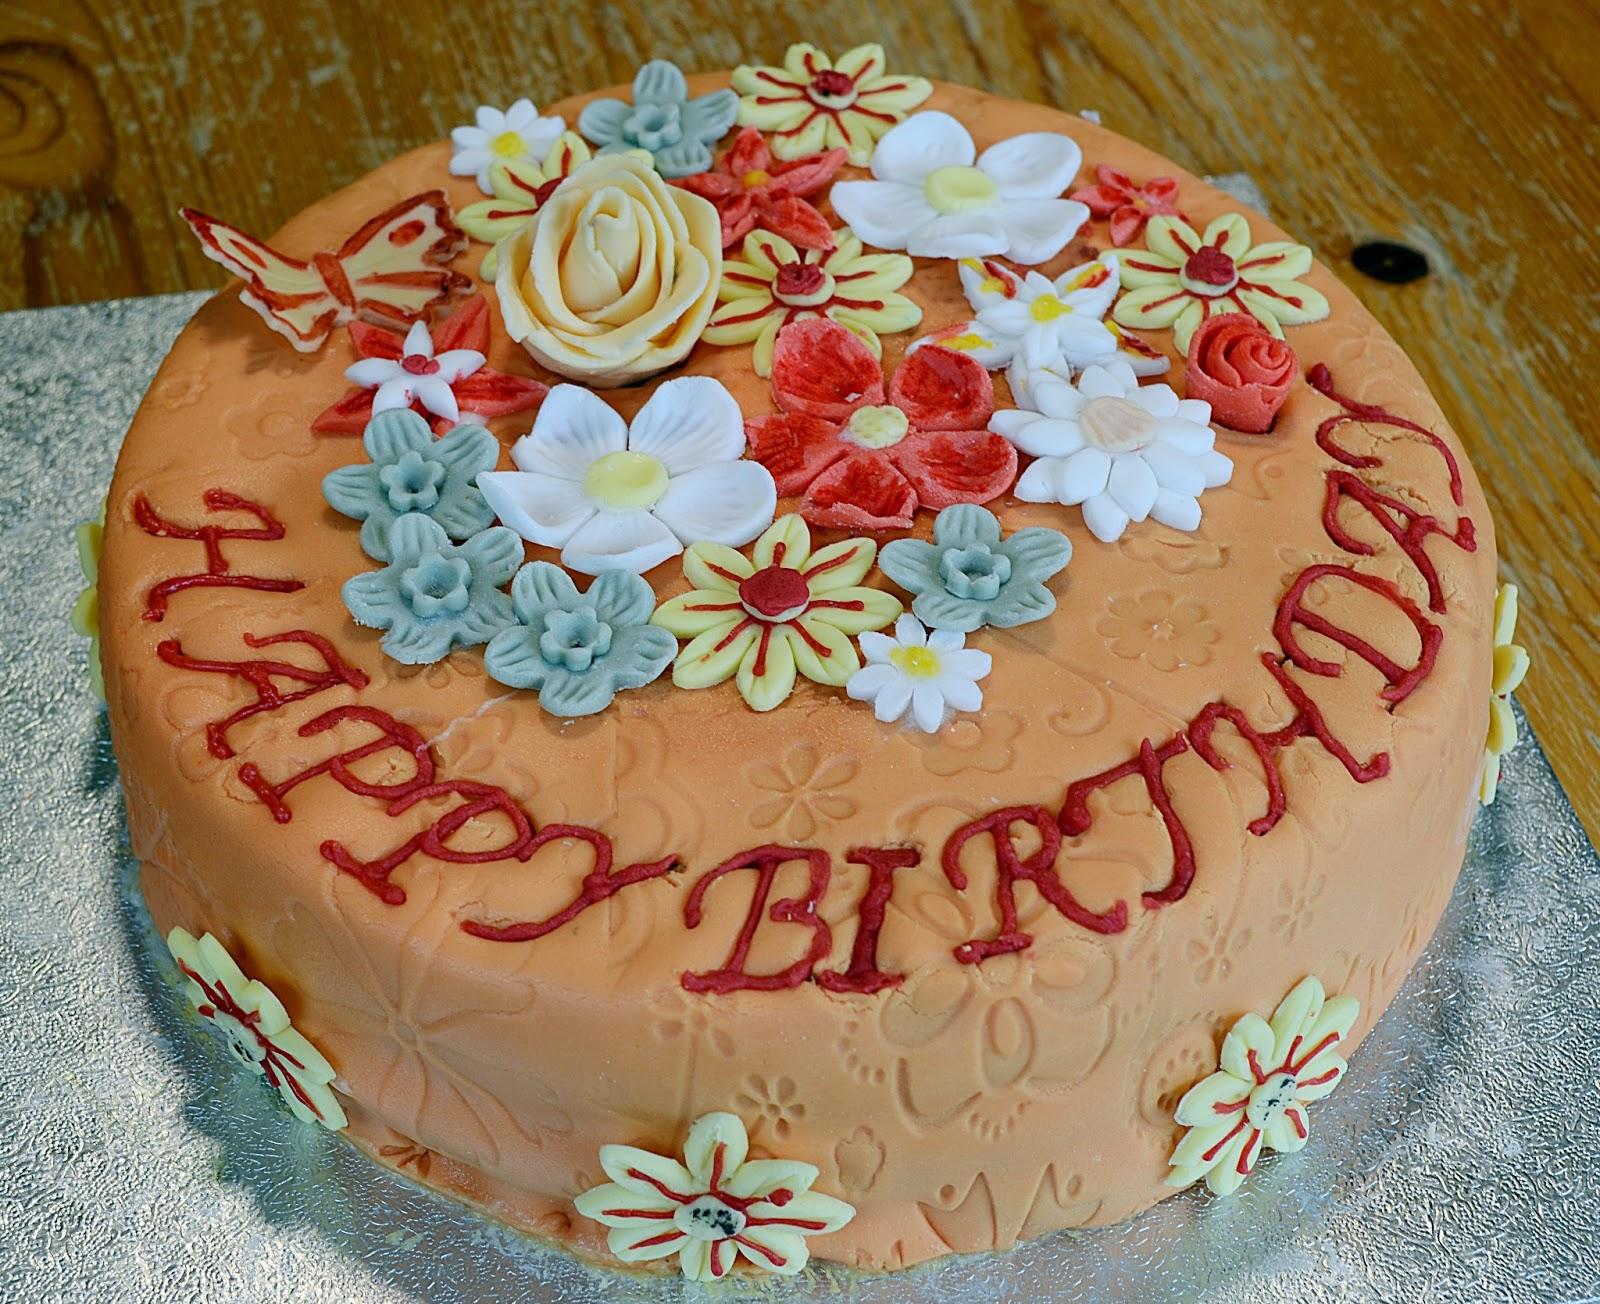 Birthday Cake Images Sue : The Amazing Cherry Cake: Happy Birthday Susan! :)